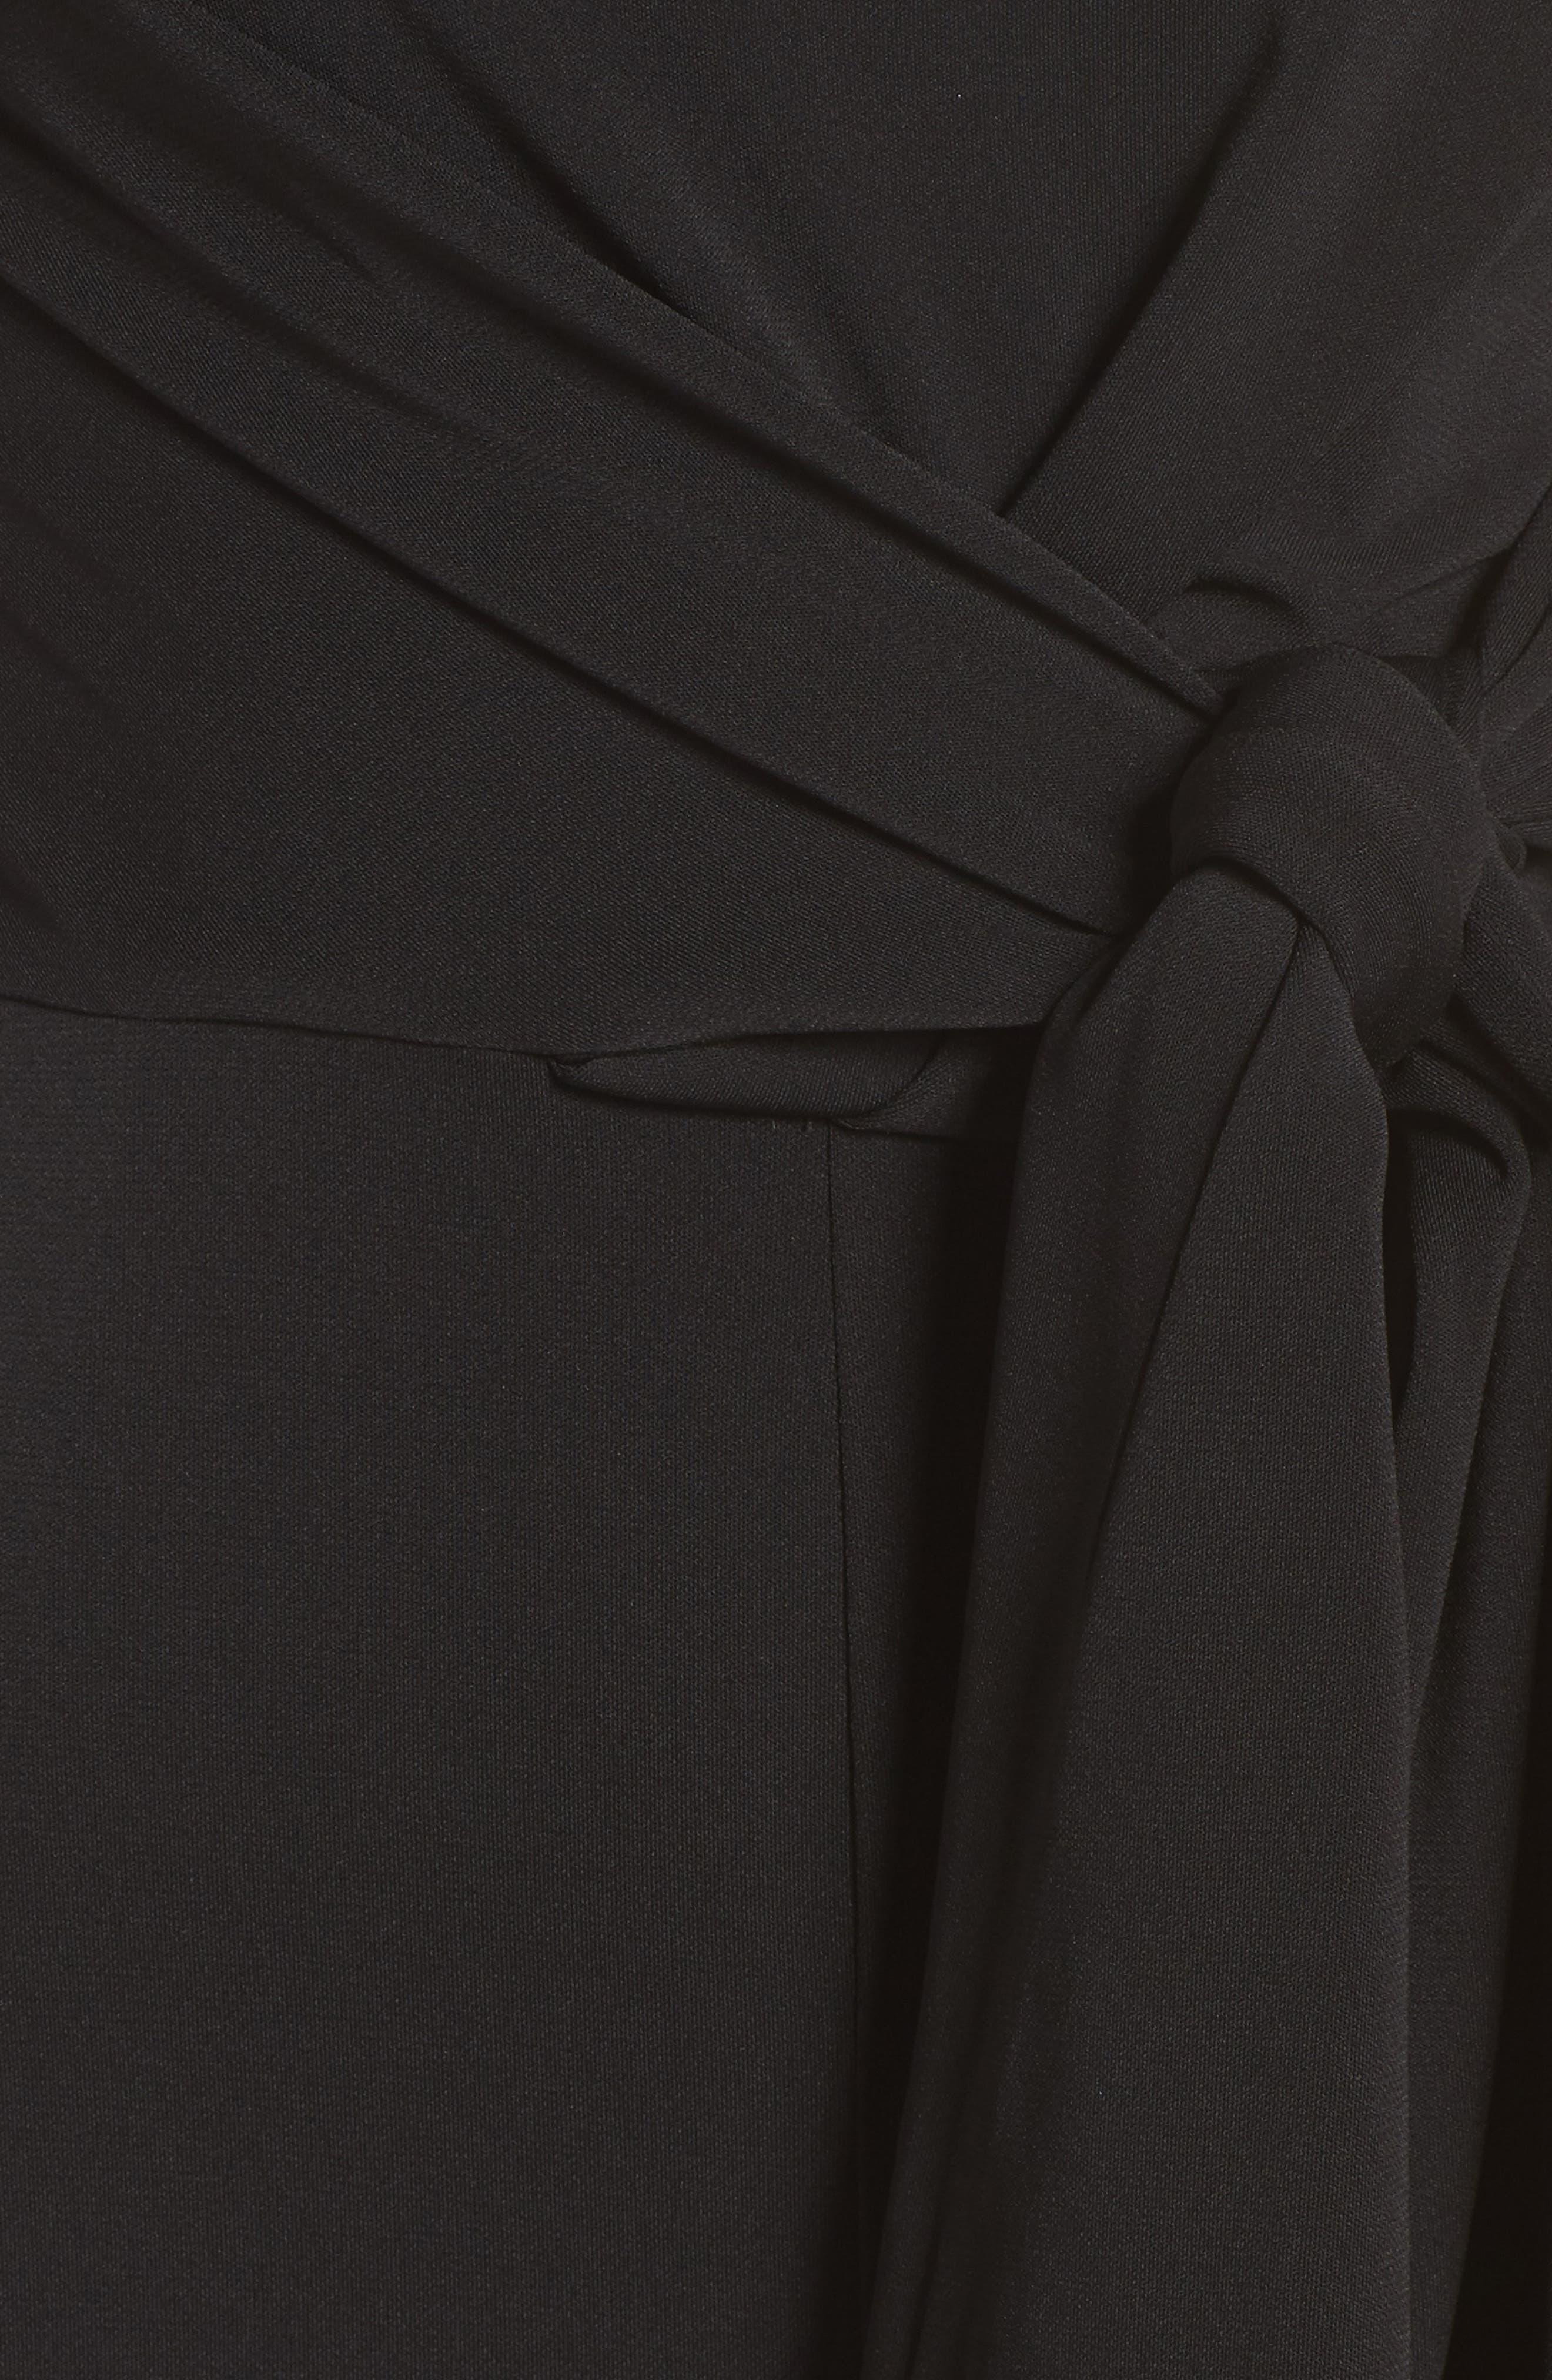 Recollect One-Shoulder Jumpsuit,                             Alternate thumbnail 5, color,                             001